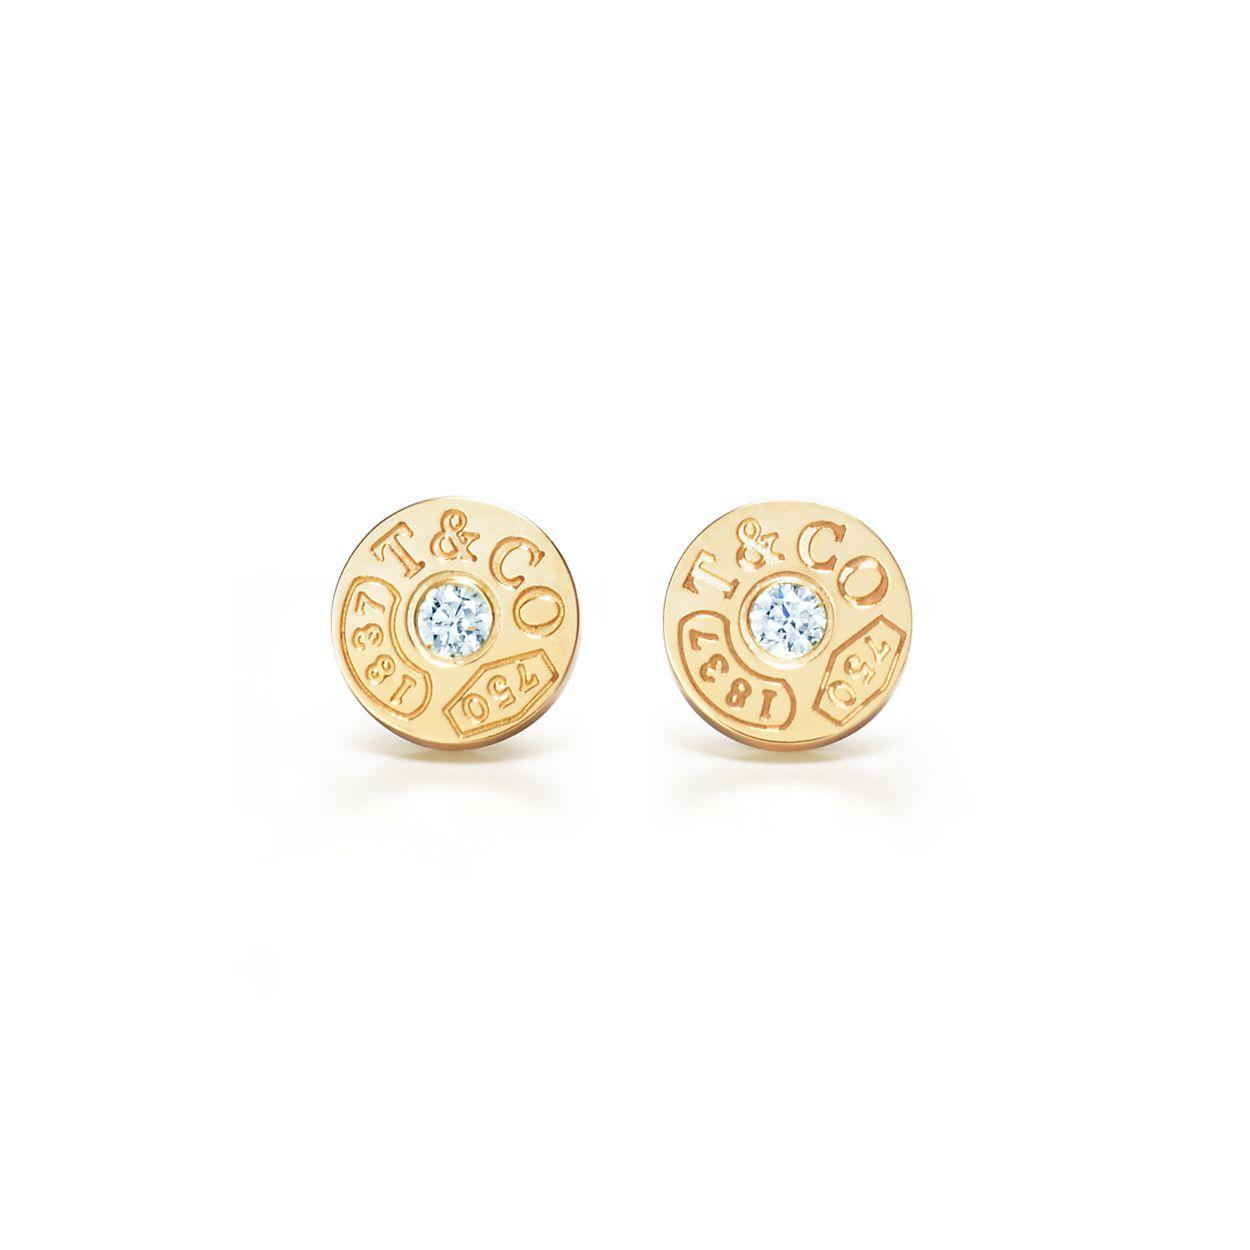 Tiffany 1837 Circle Earrings